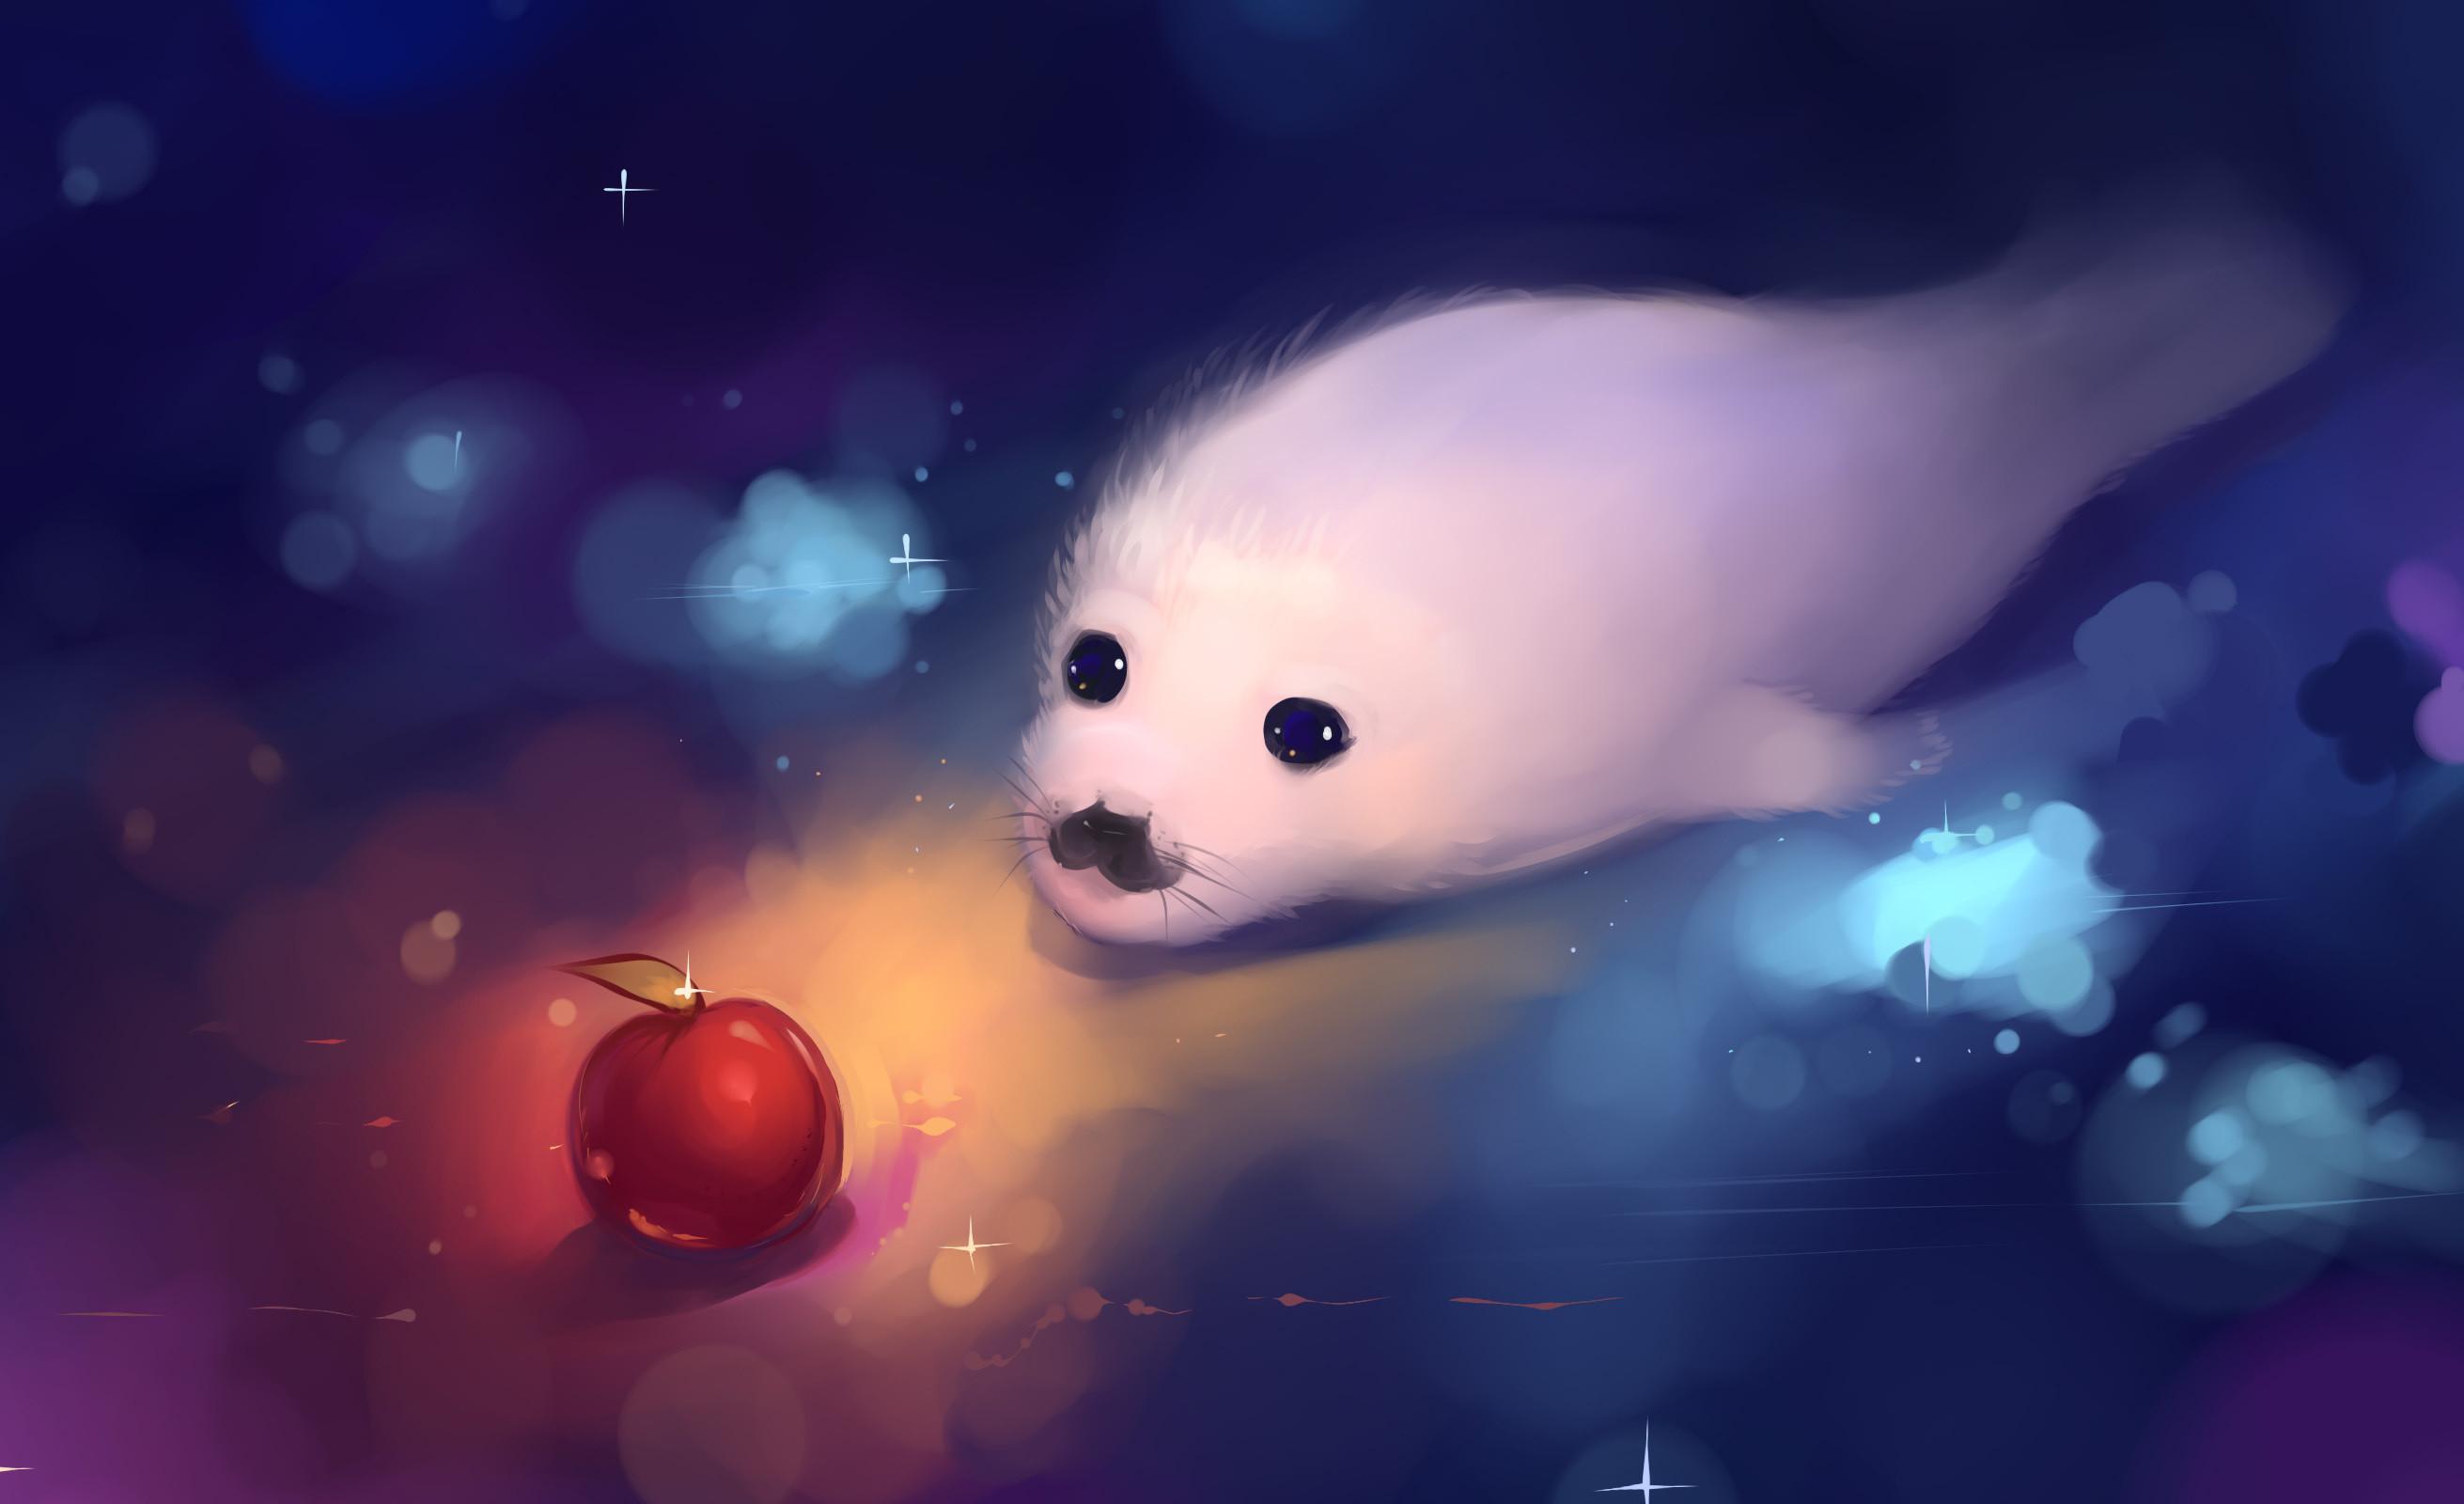 Cute Panda Iphone Wallpapers Cute Anime Animals Wallpaper 63 Images